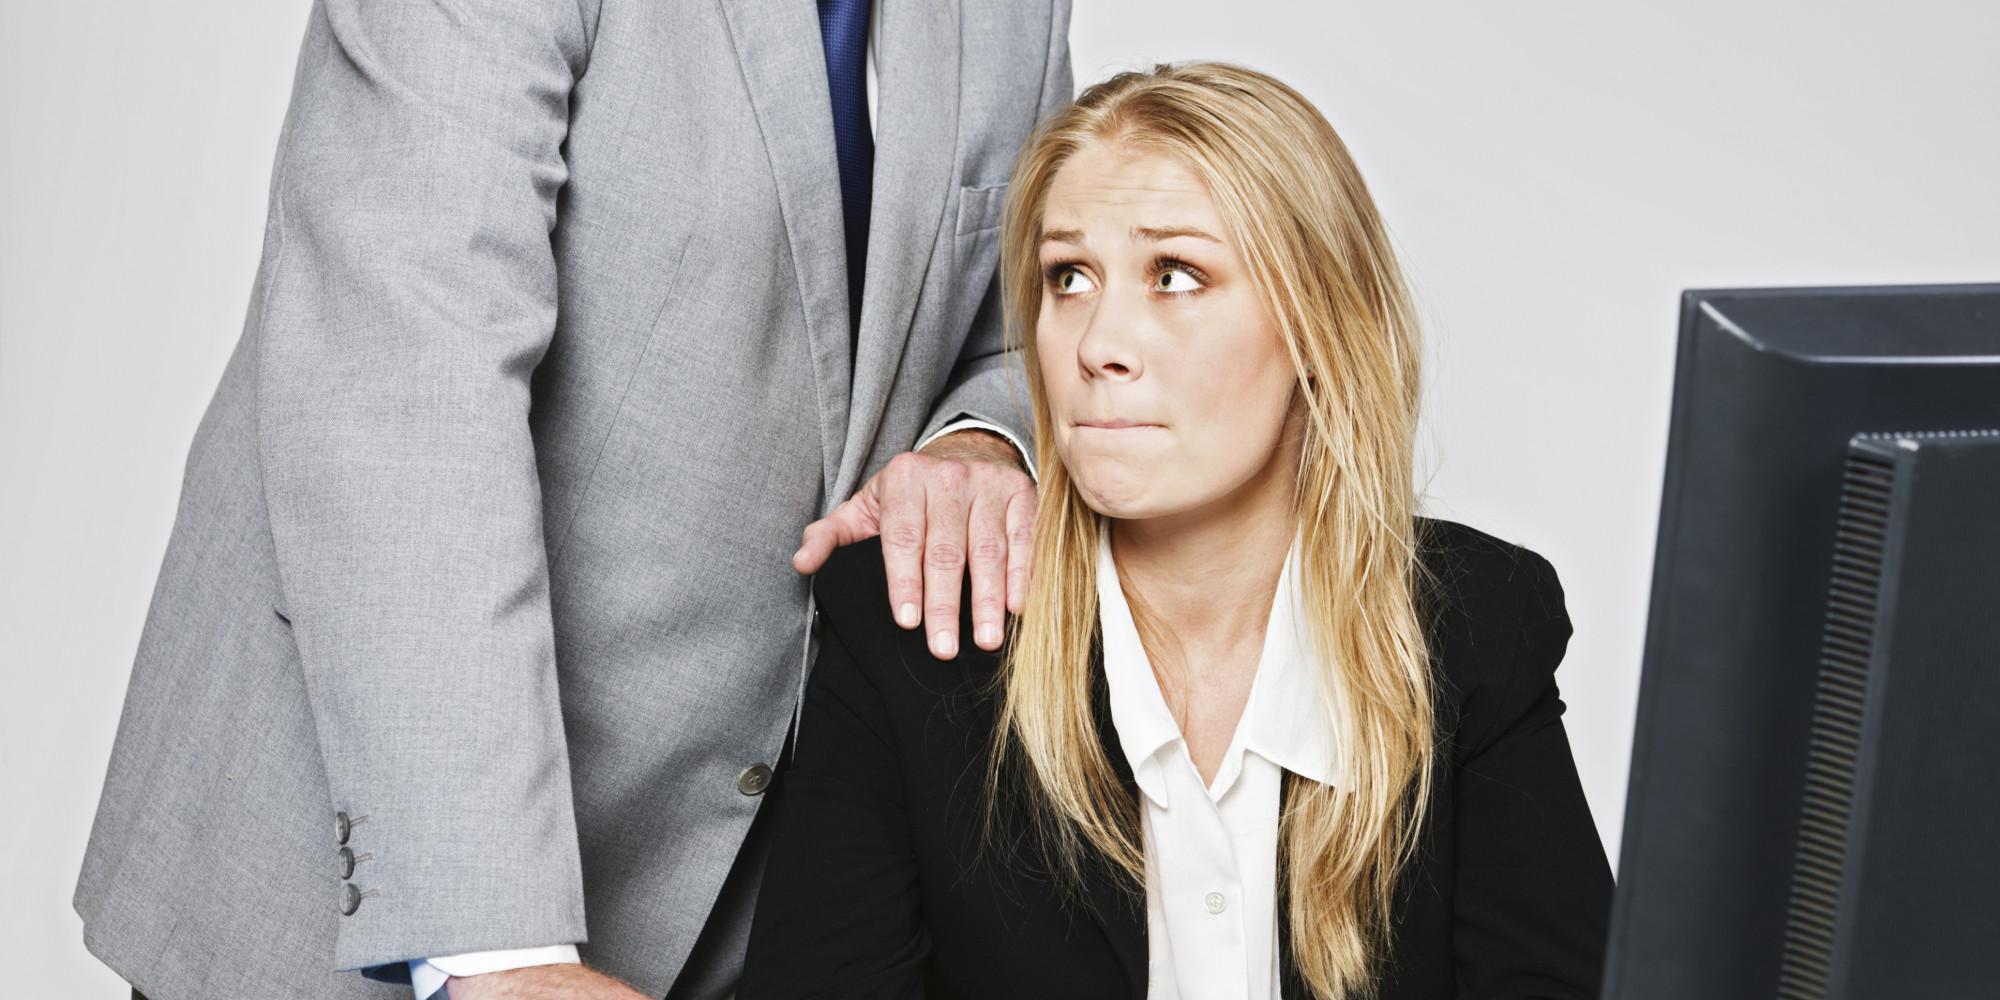 Stop Making Excuses For Lecherous Men | HuffPost